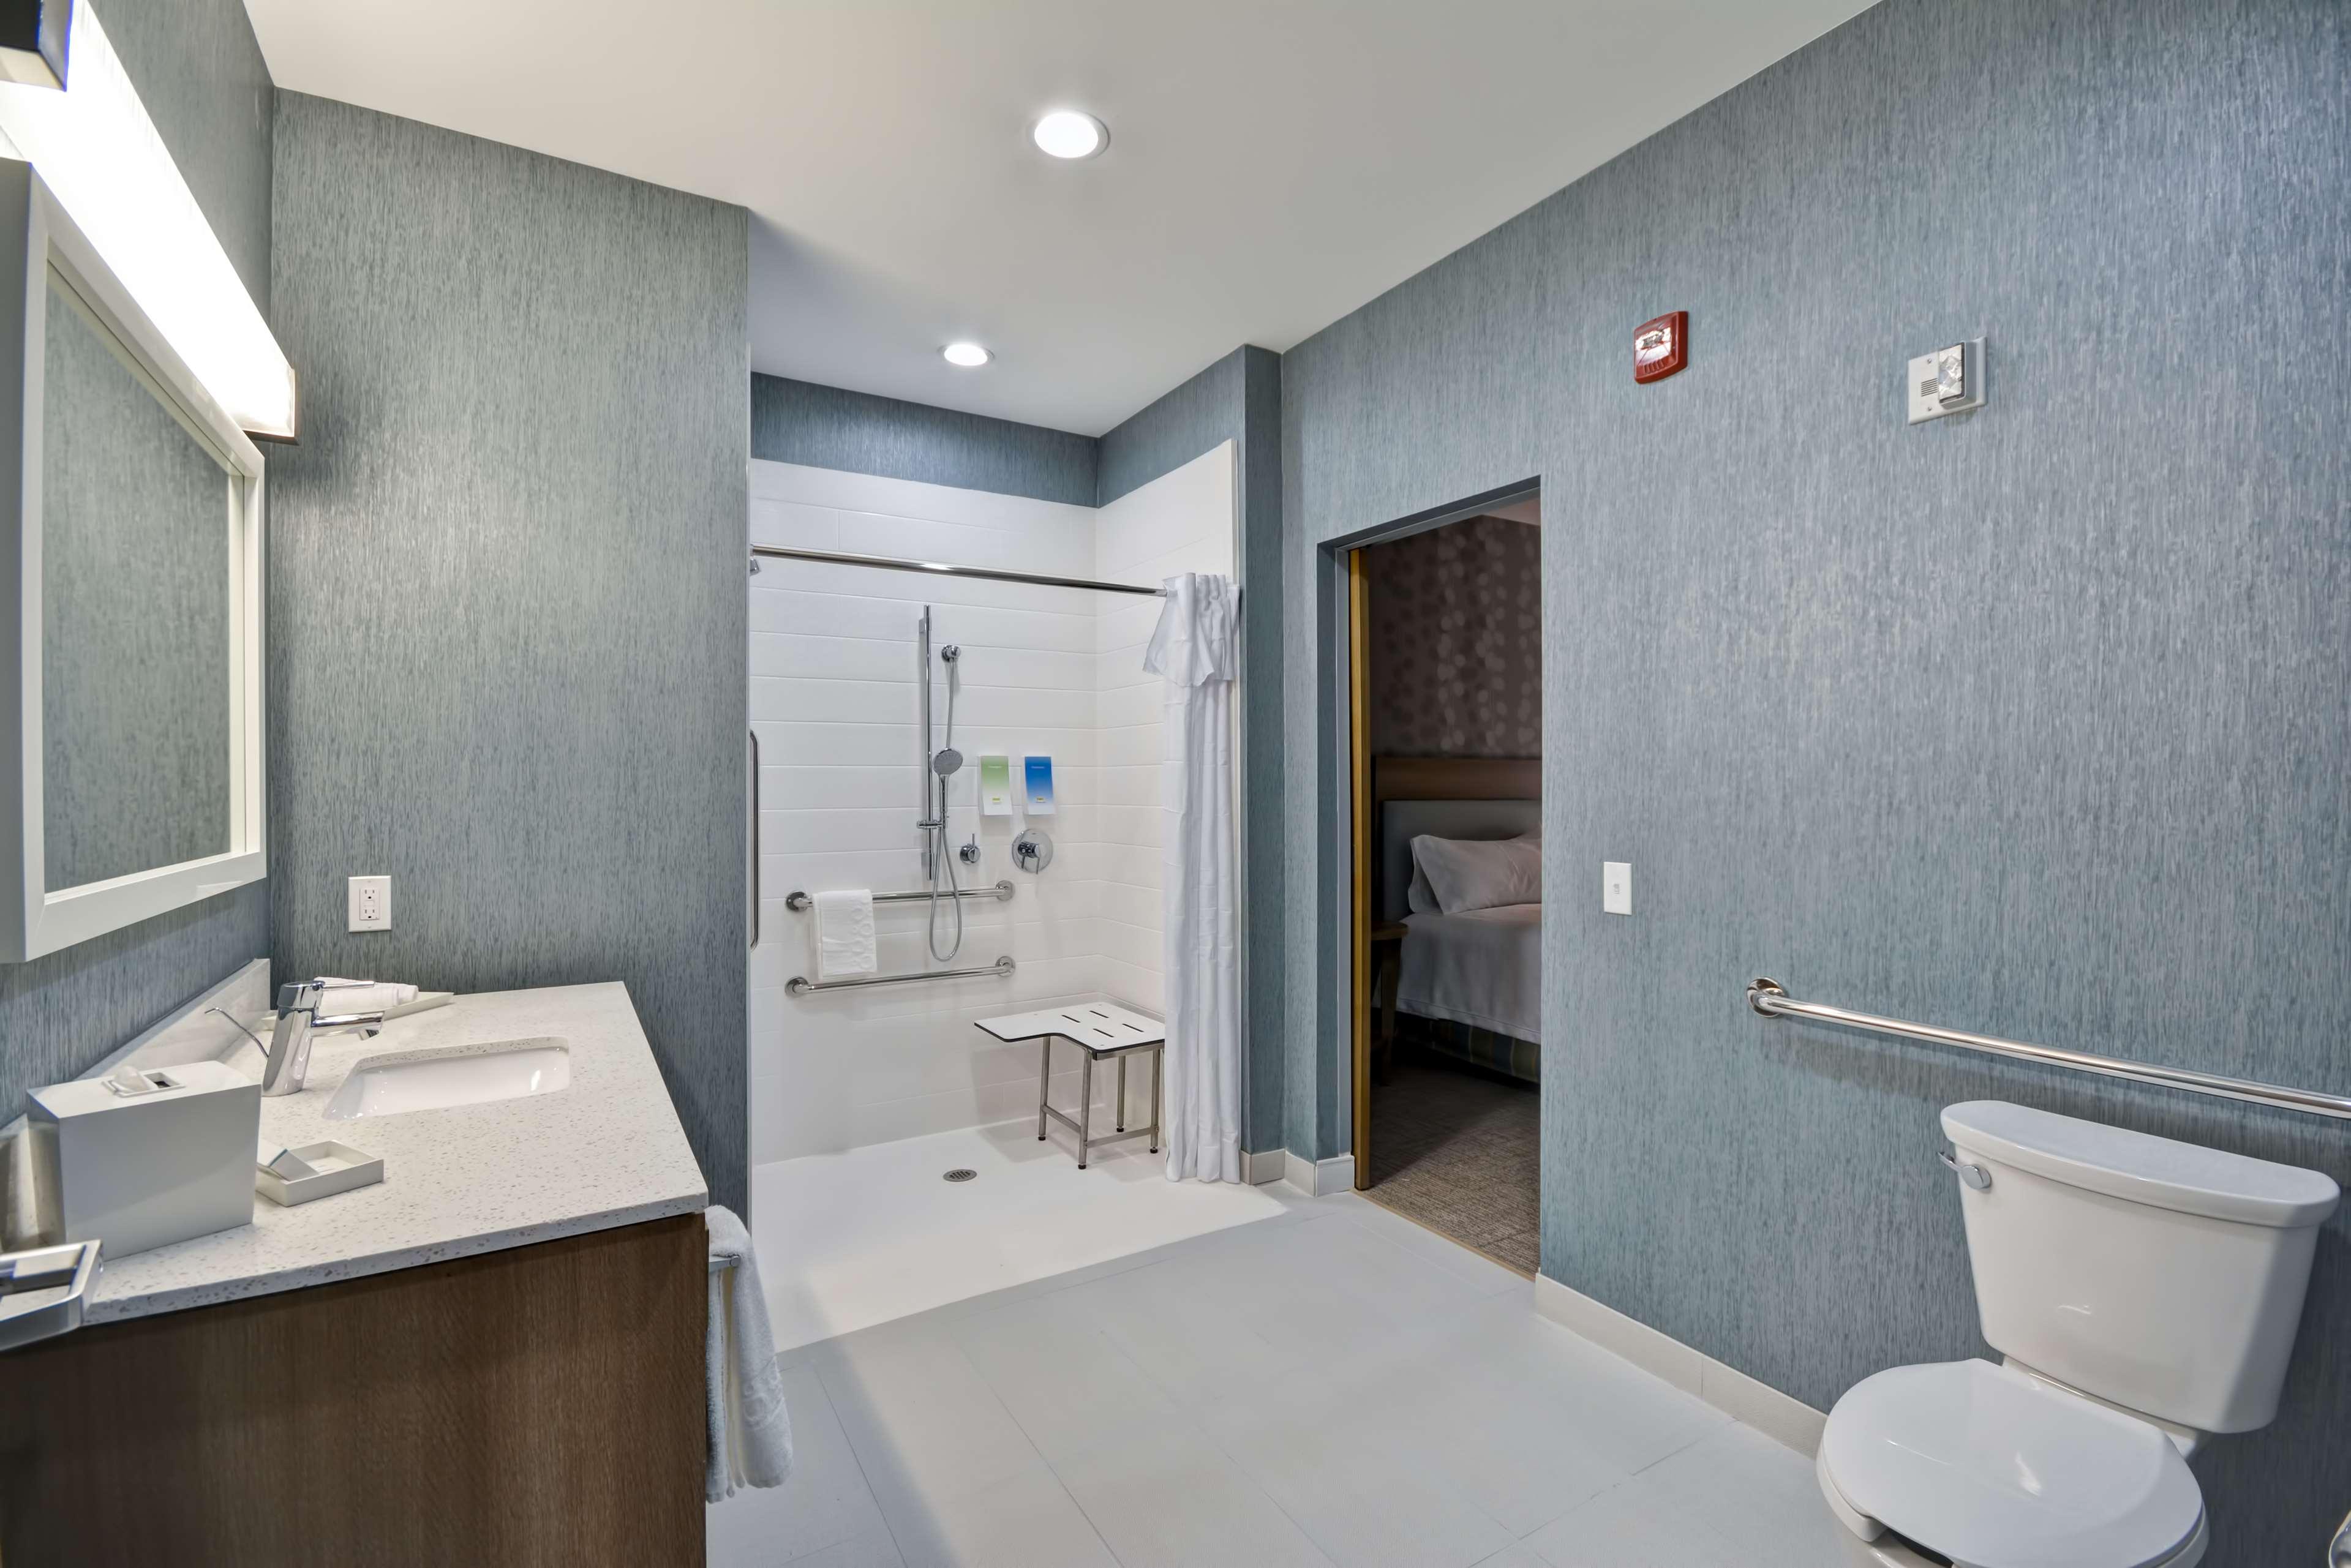 Home2 Suites by Hilton Jackson image 19